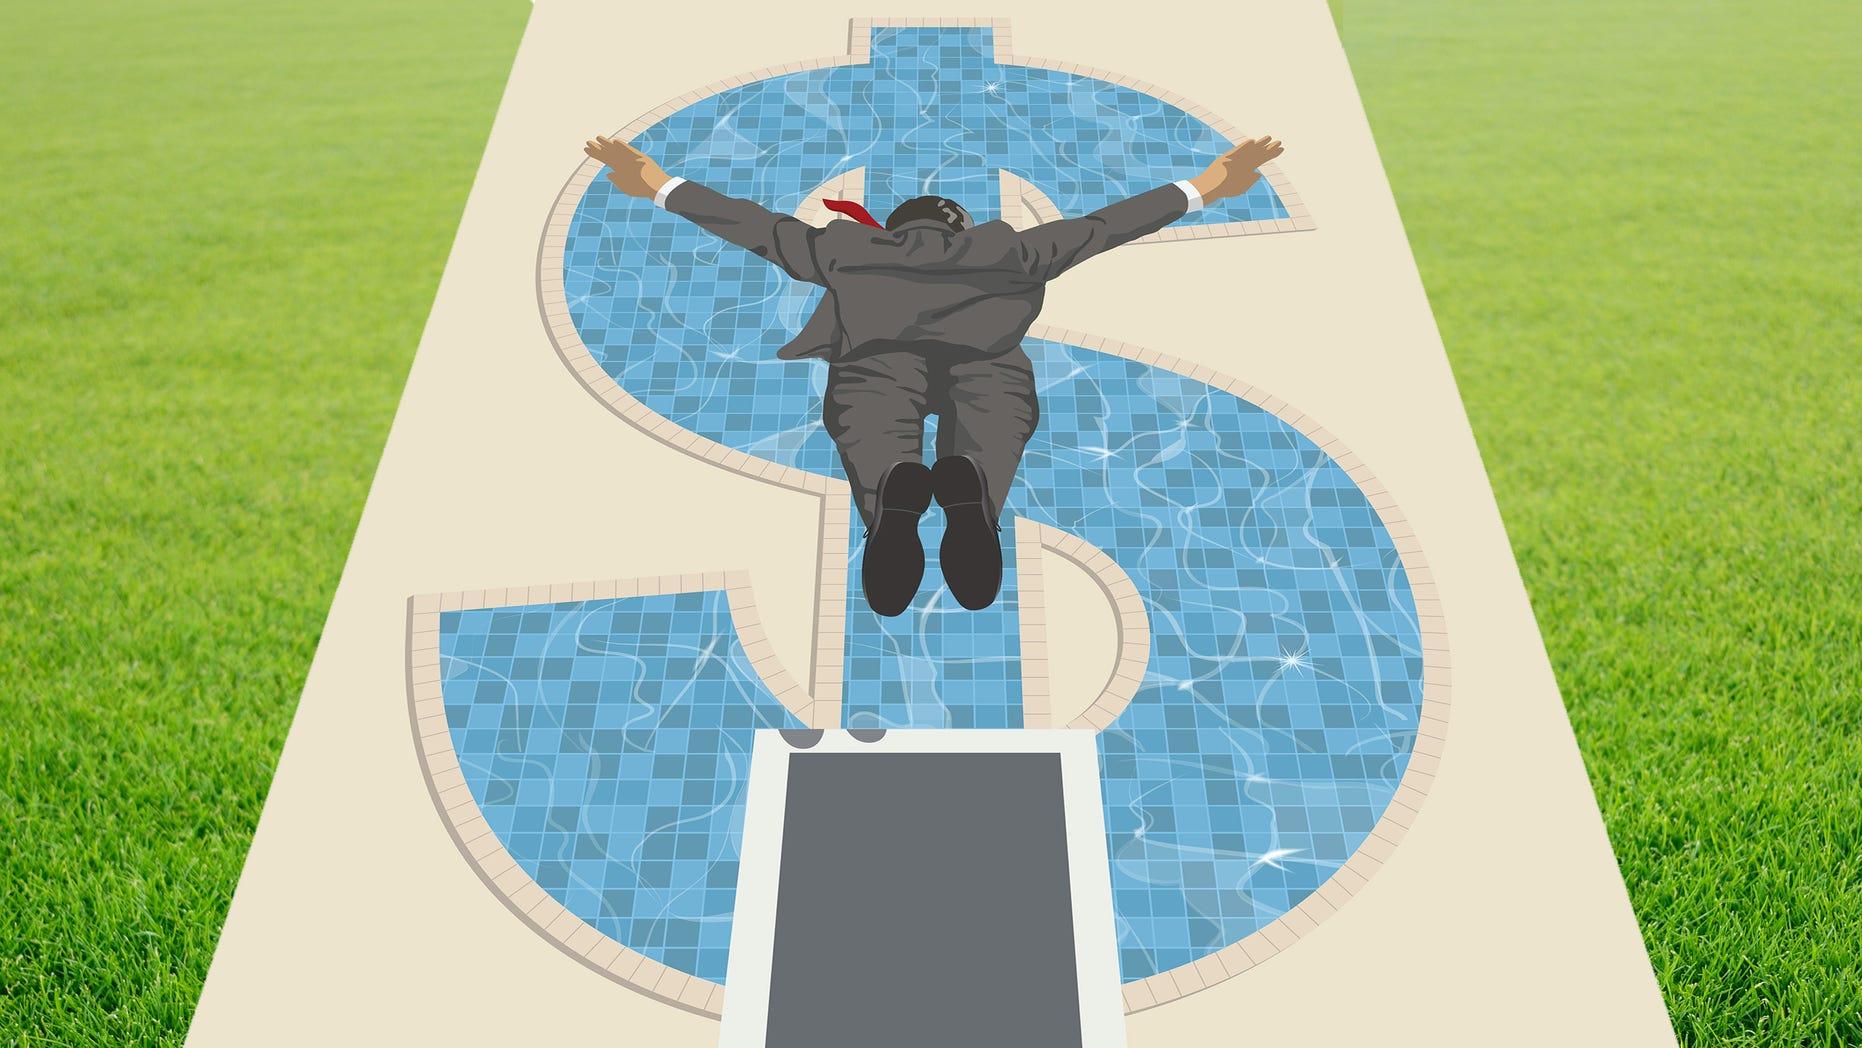 man diving into dollar-shaped swimming pool